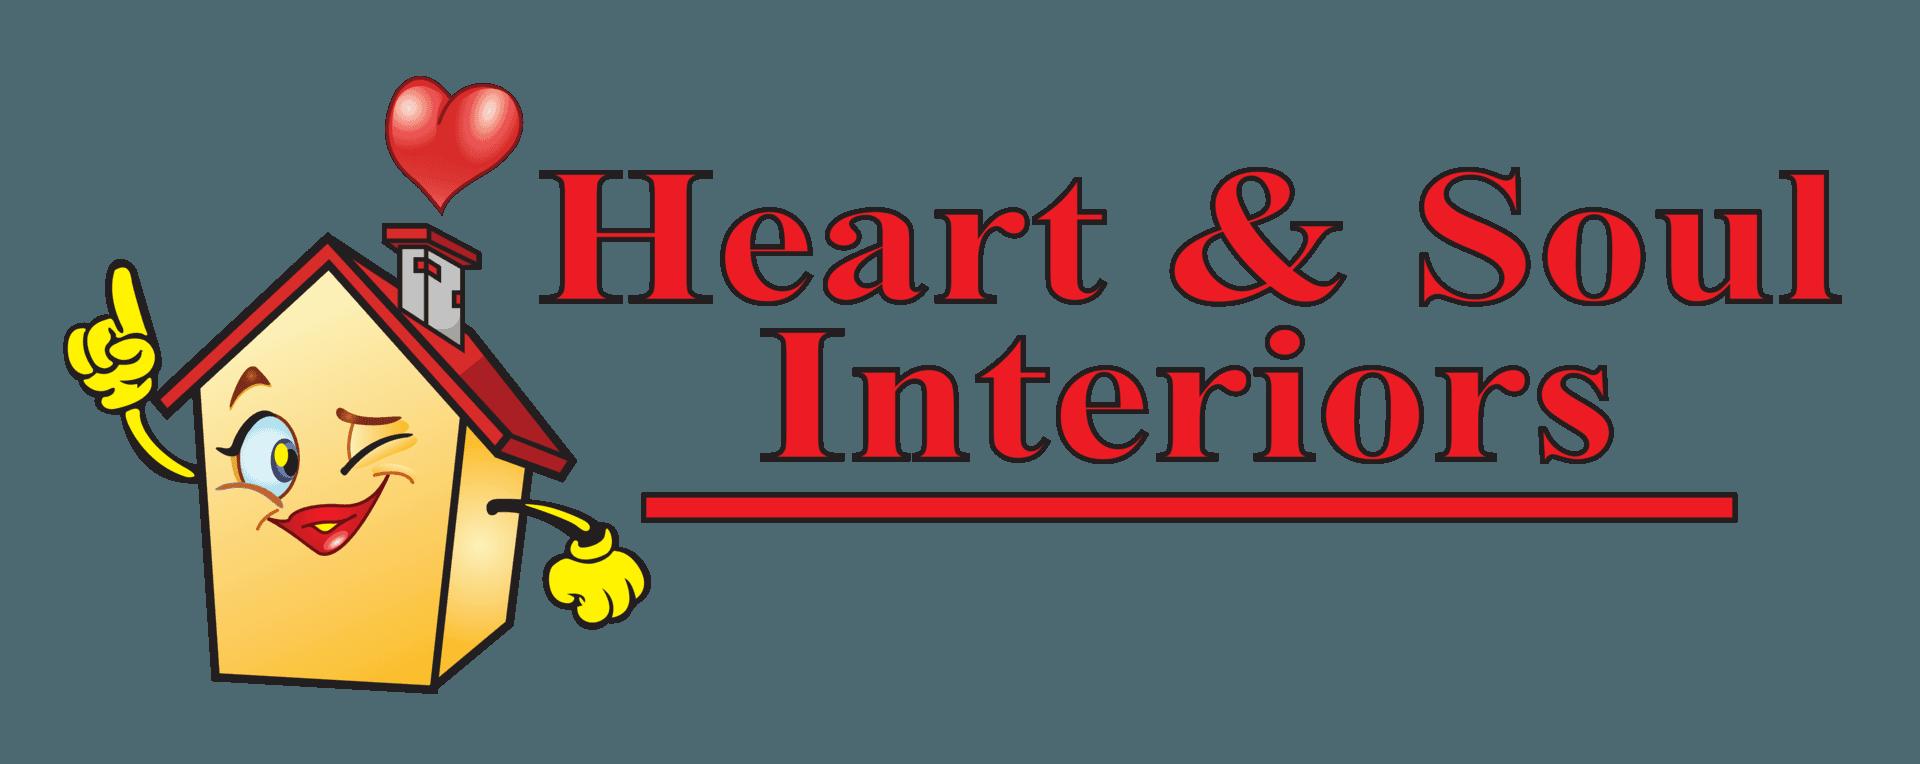 Heart & Soul Interiors